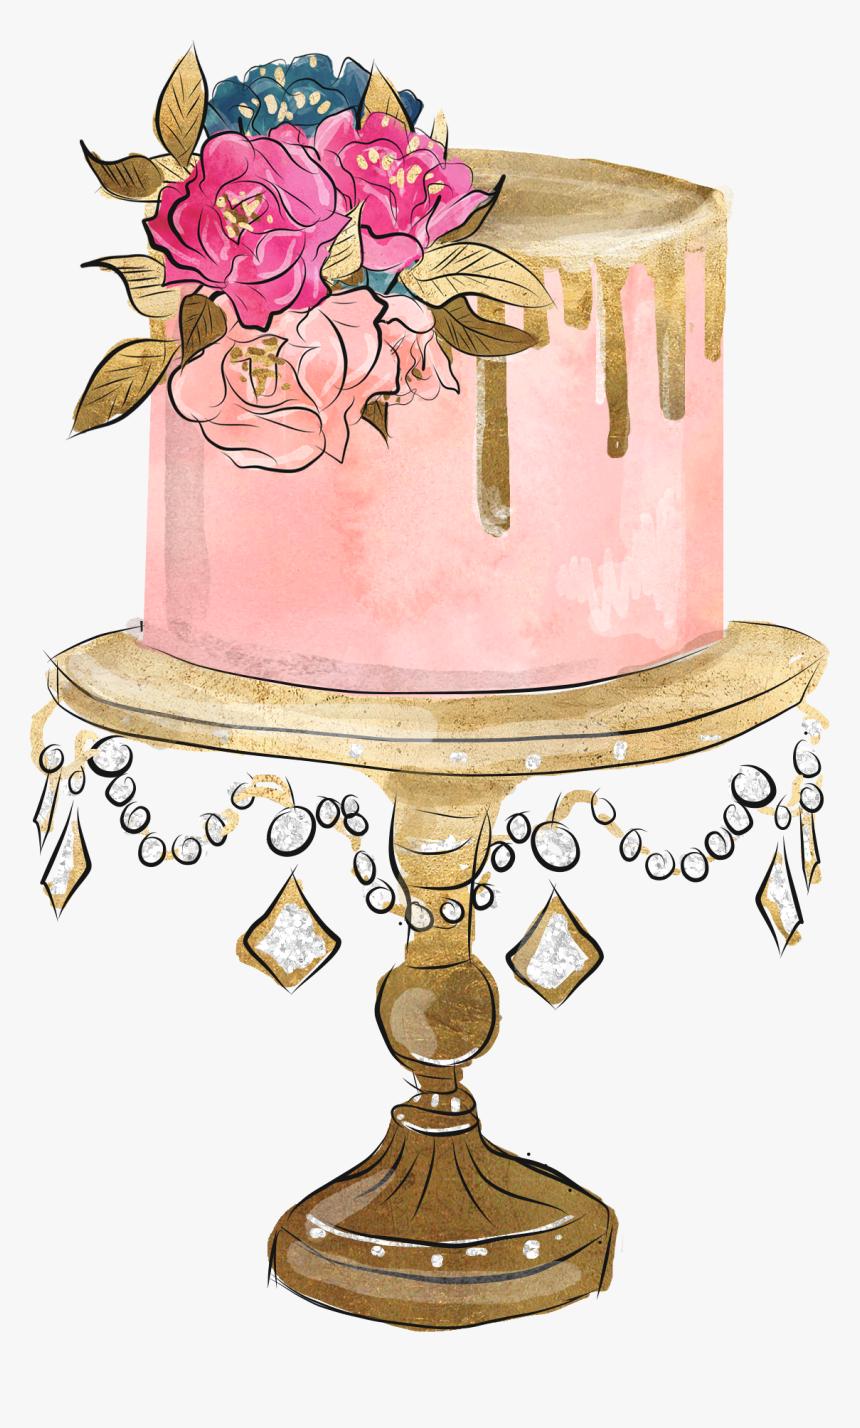 Desenho De Bolo Em Aquarela Hd Png Download Is Free Transparent Png Image To Explore More Similar Hd Image On Pn Cake Illustration Cake Drawing Painted Cakes